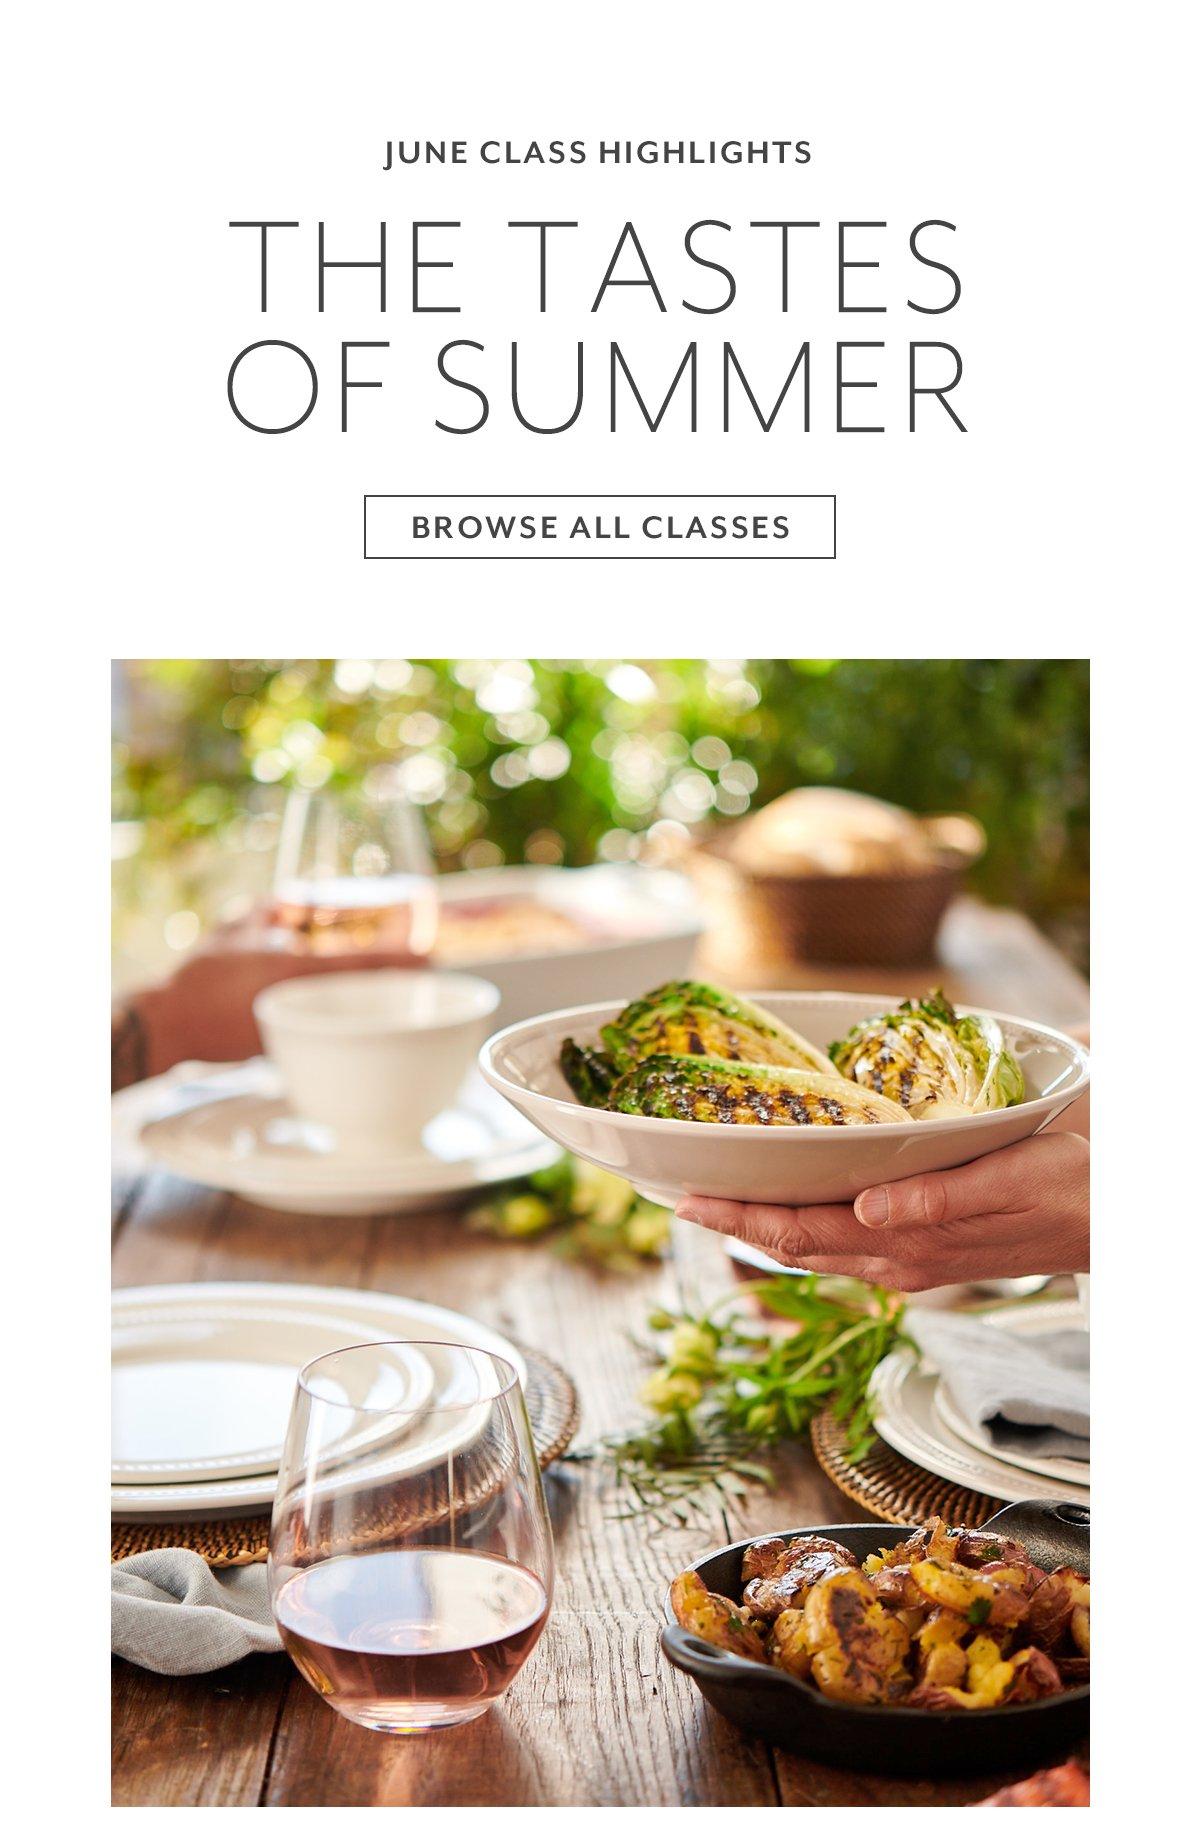 The Tastes of Summer